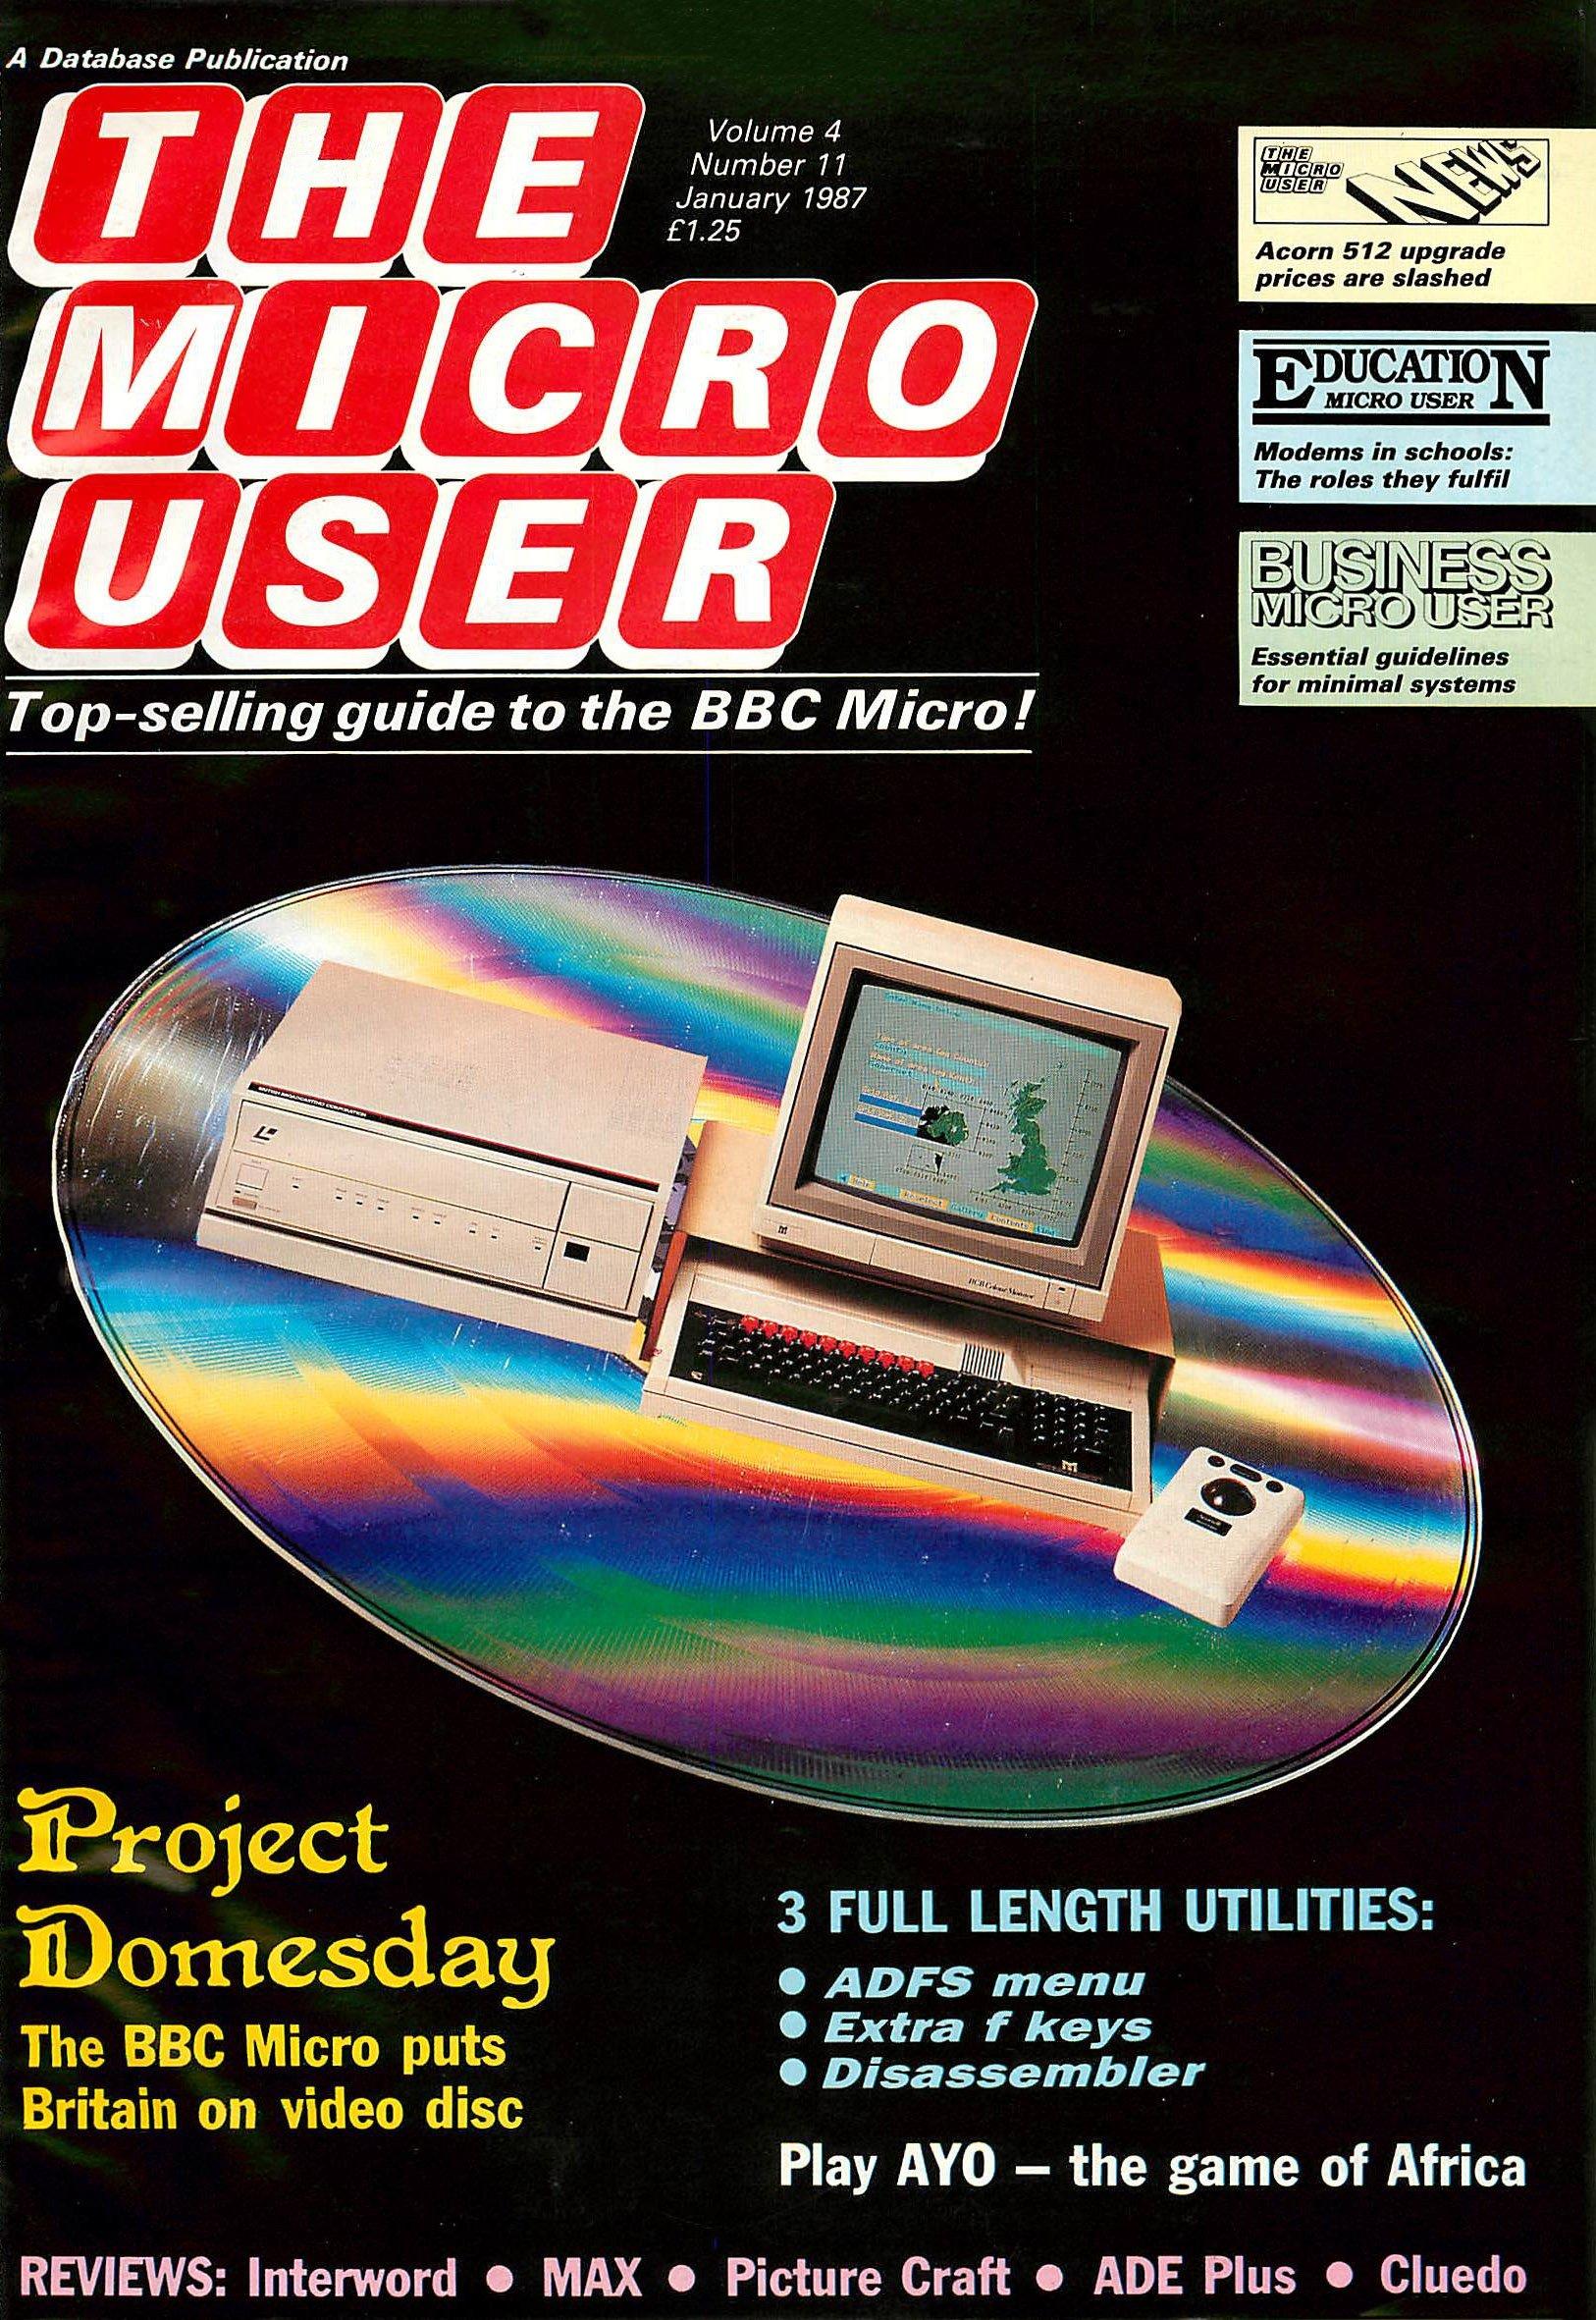 The Micro User Vol.04 No.11 (January 1987)